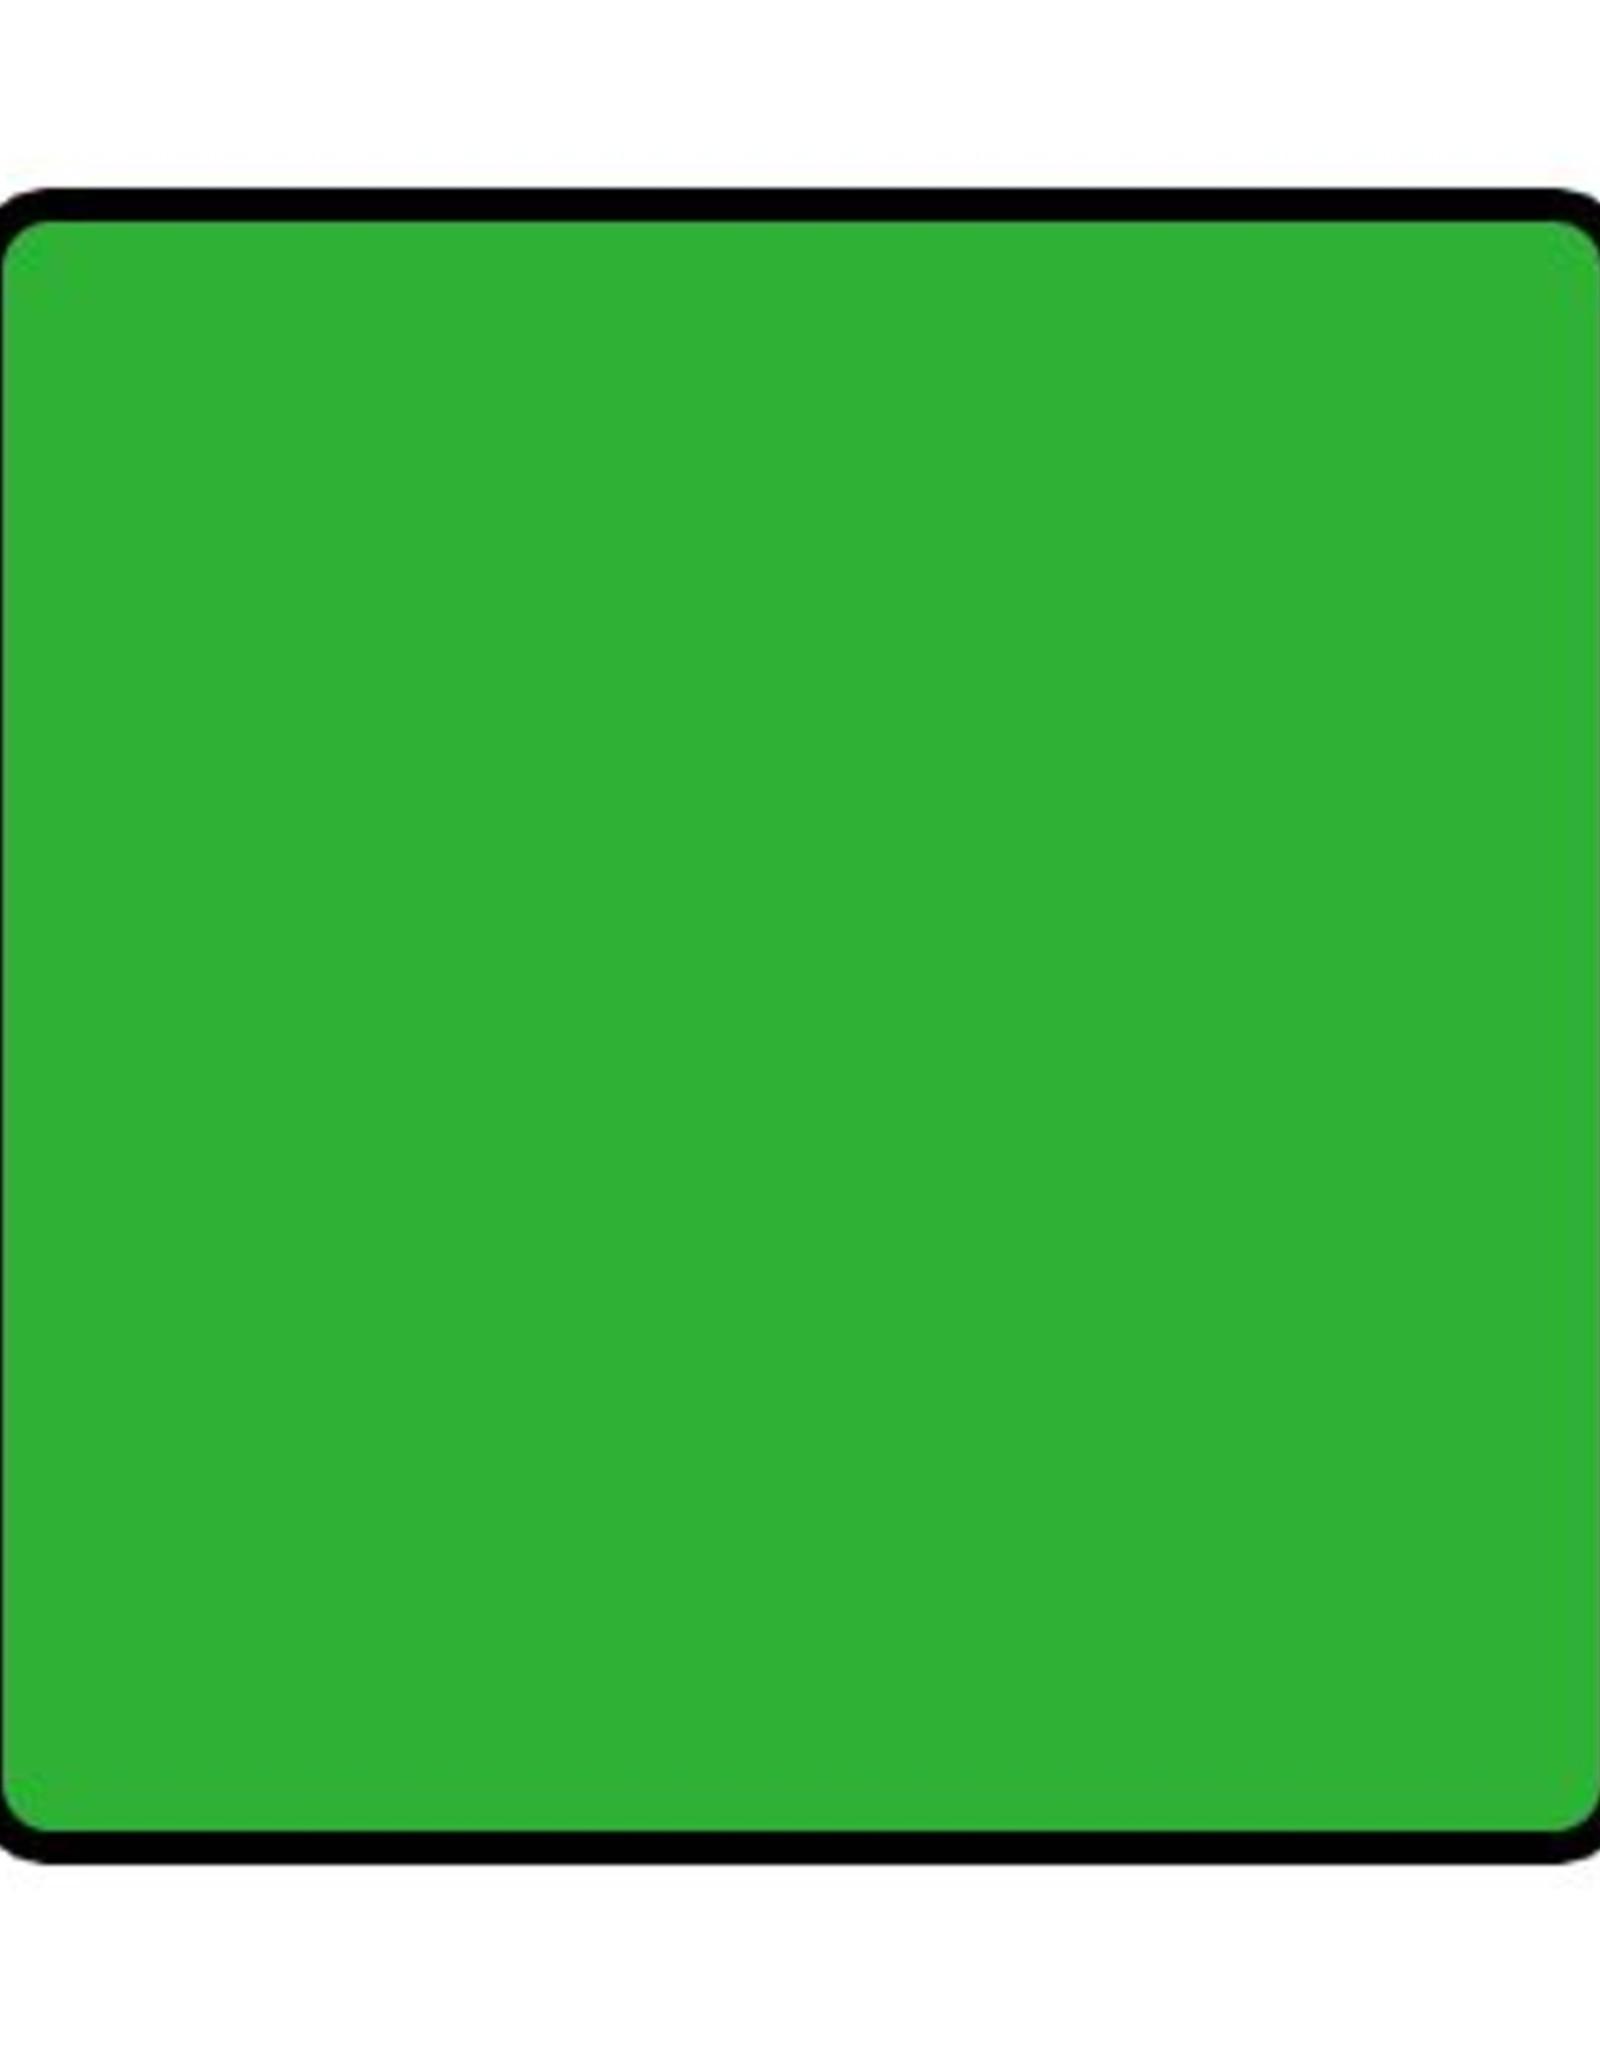 Kitty Fluff Ragdoll - Lime Green